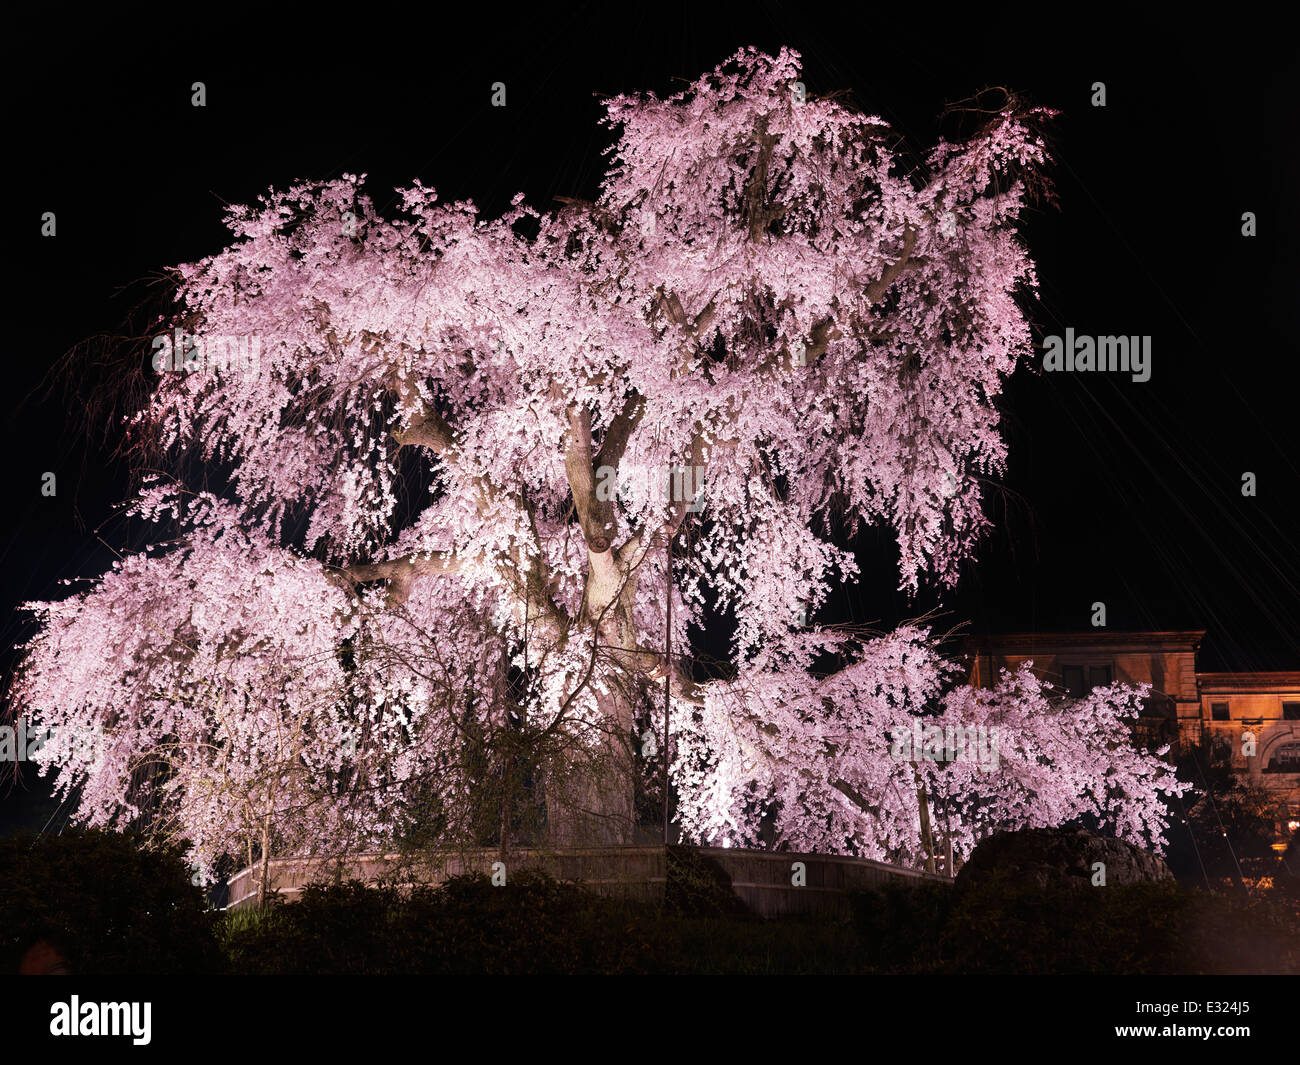 Old weeping cherry tree, shidarezakura, lit up at night in Maruyama park, Gion, Kyoto, Japan 2014 - Stock Image